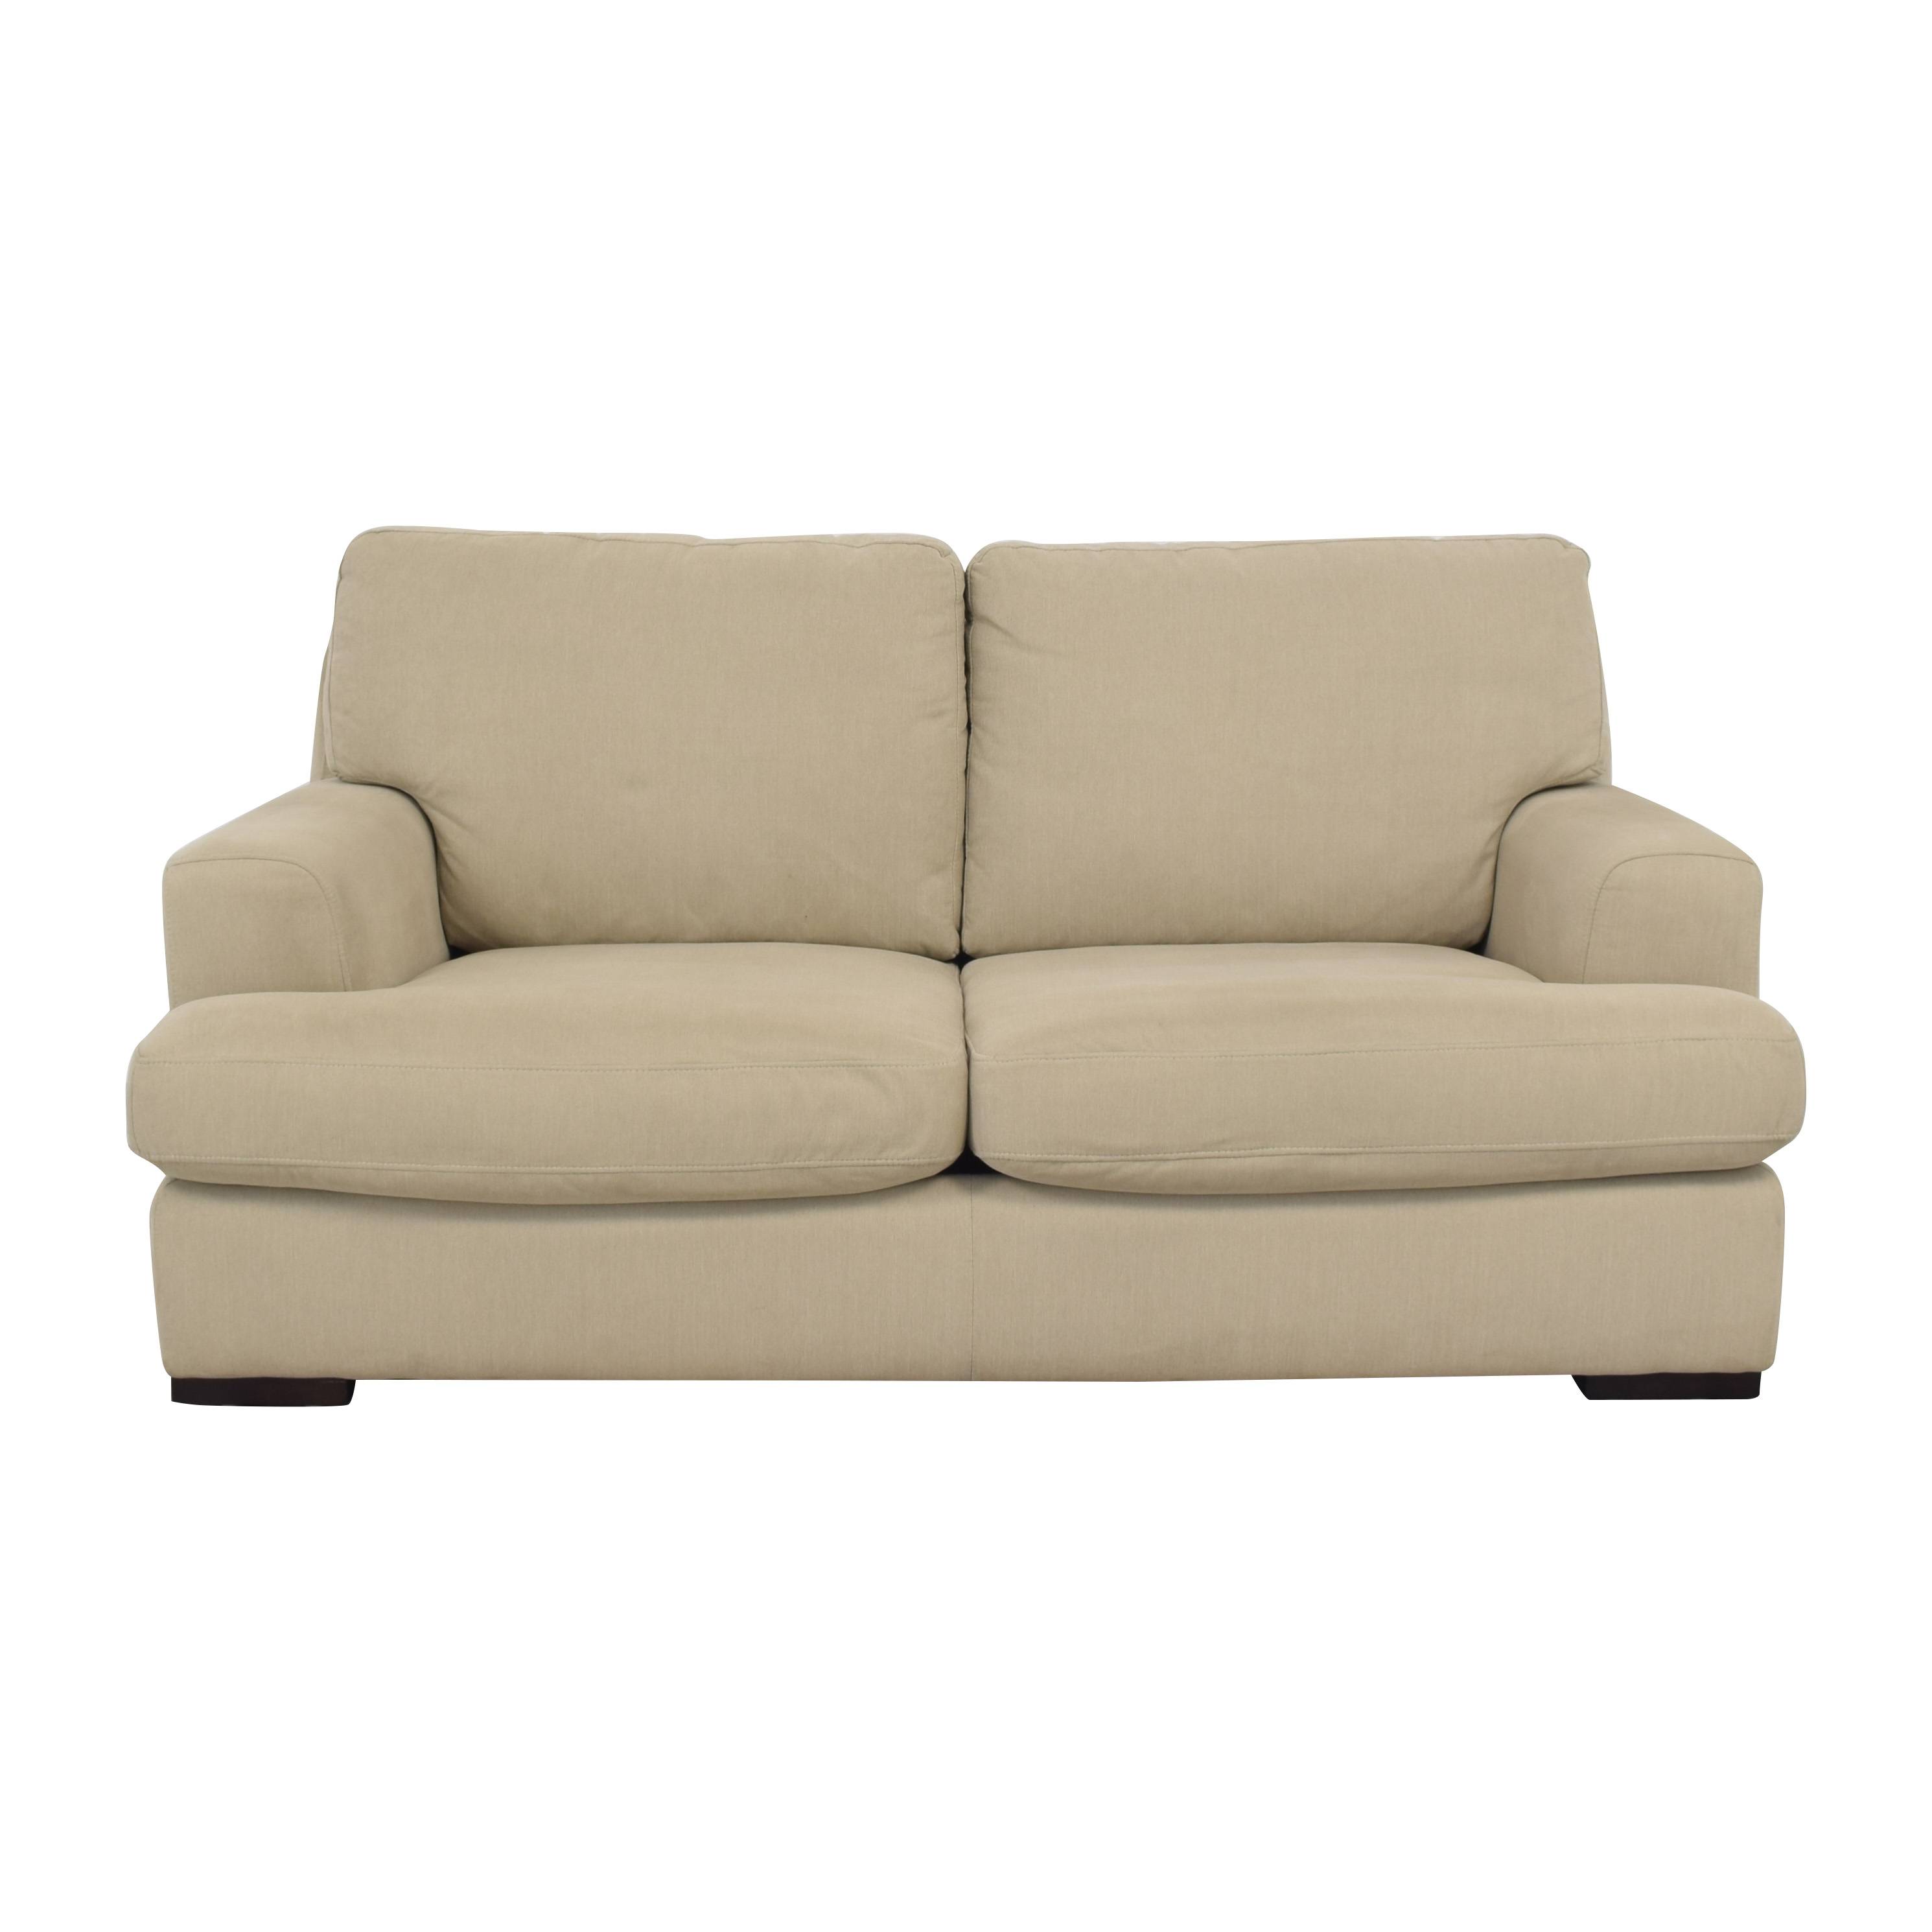 buy Stone & Beam Stone & Beam Lauren Down-Filled Oversized Sofa online